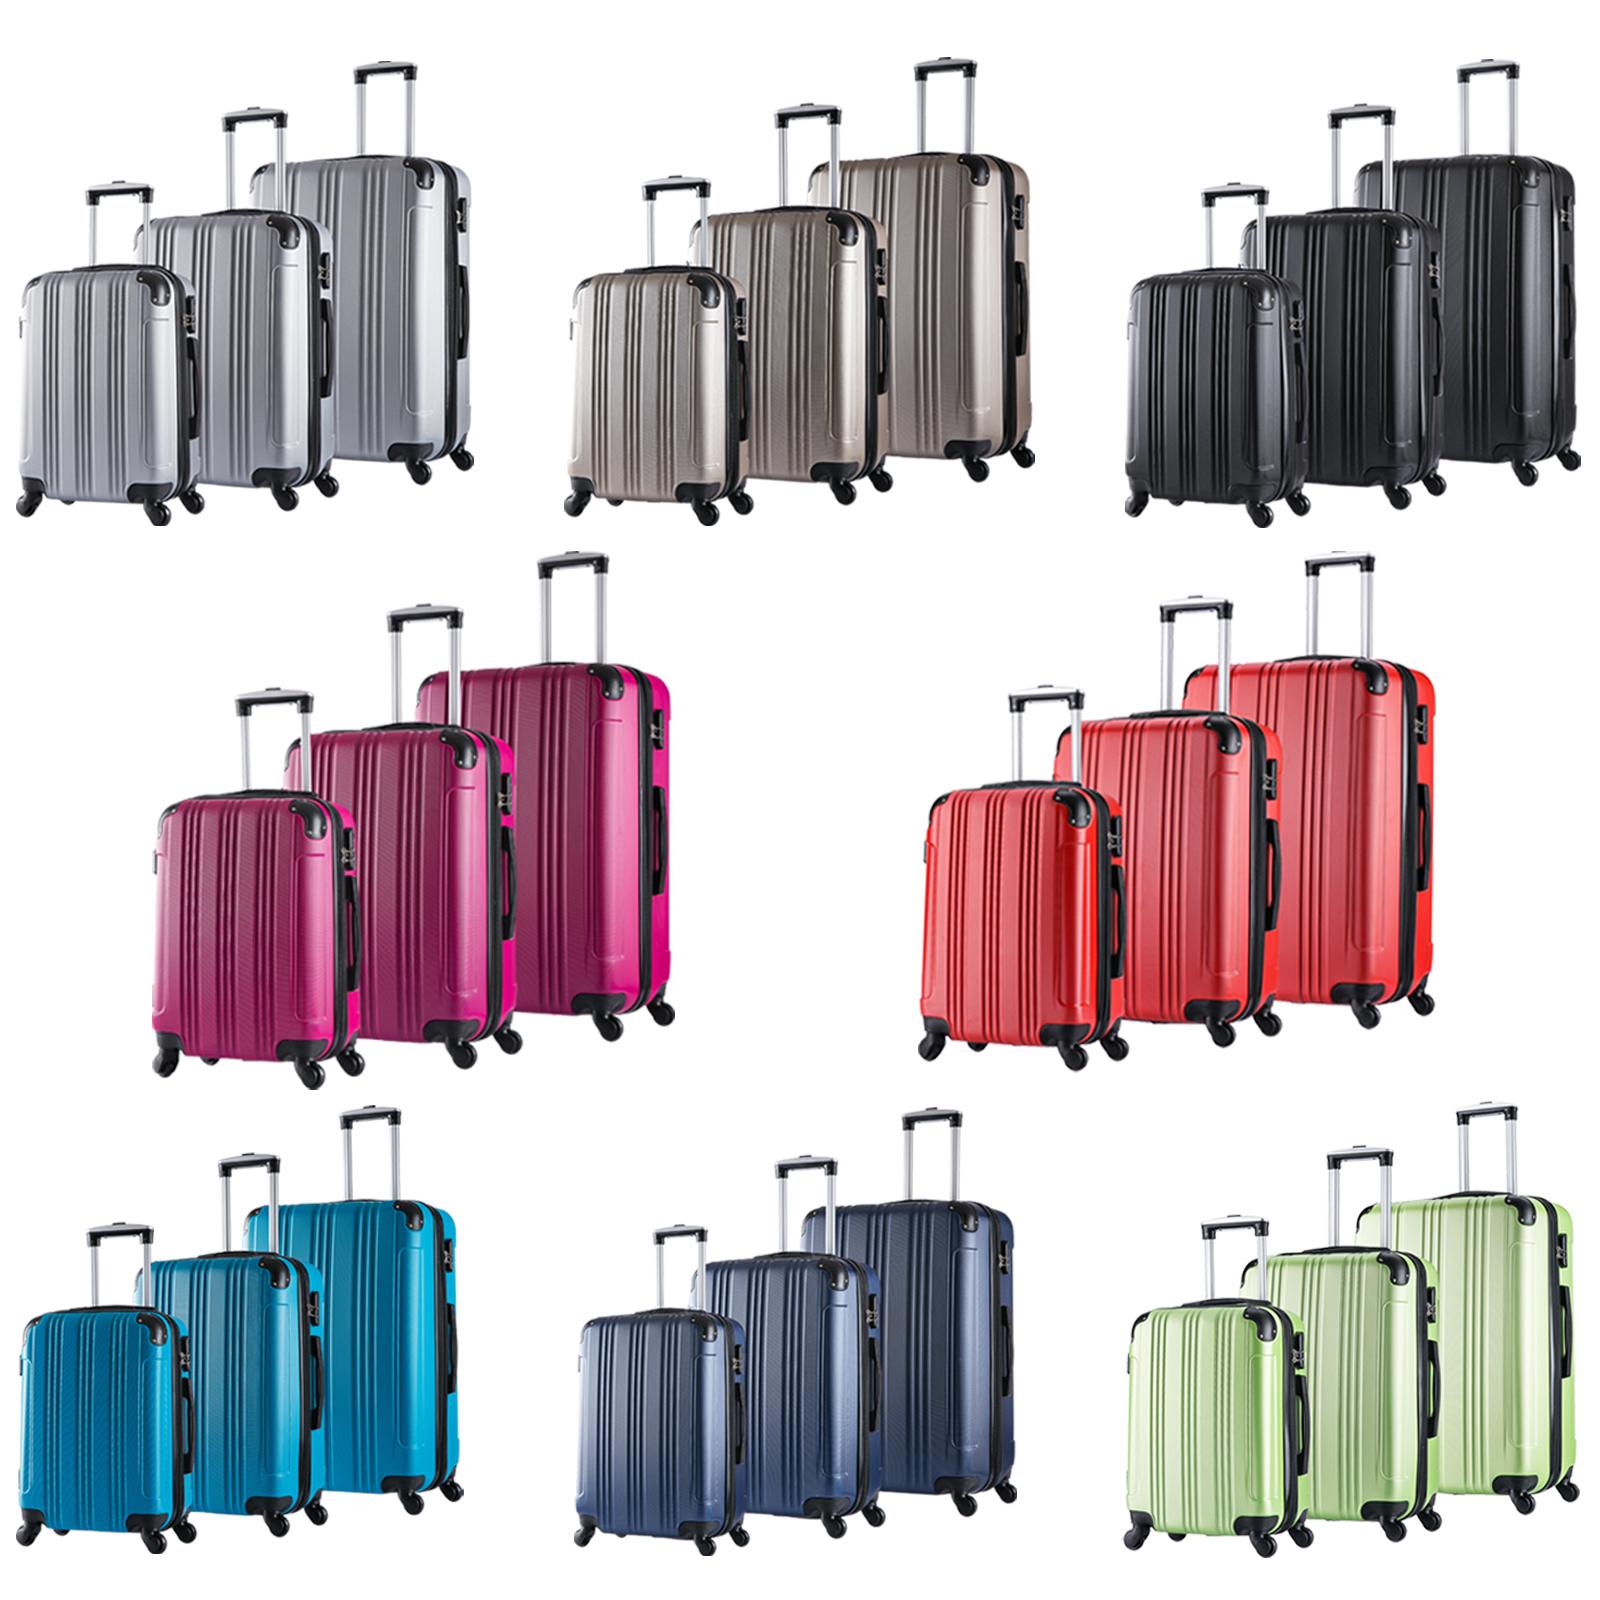 reise koffer trolley set reisekofferset hartschalenkoffer. Black Bedroom Furniture Sets. Home Design Ideas